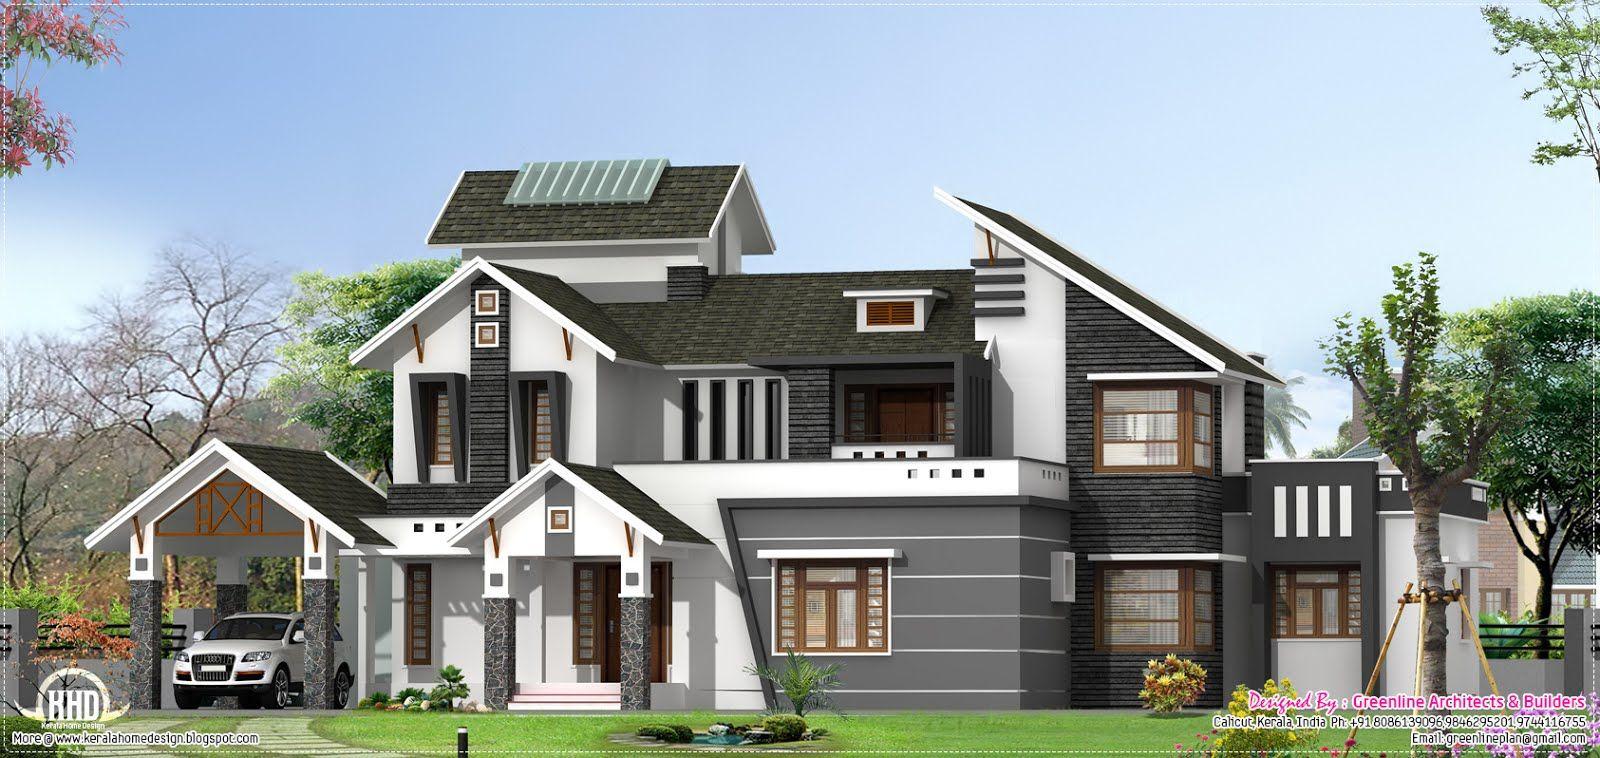 Icymi large bedroom house plans uk buyinstagramslikescheap in